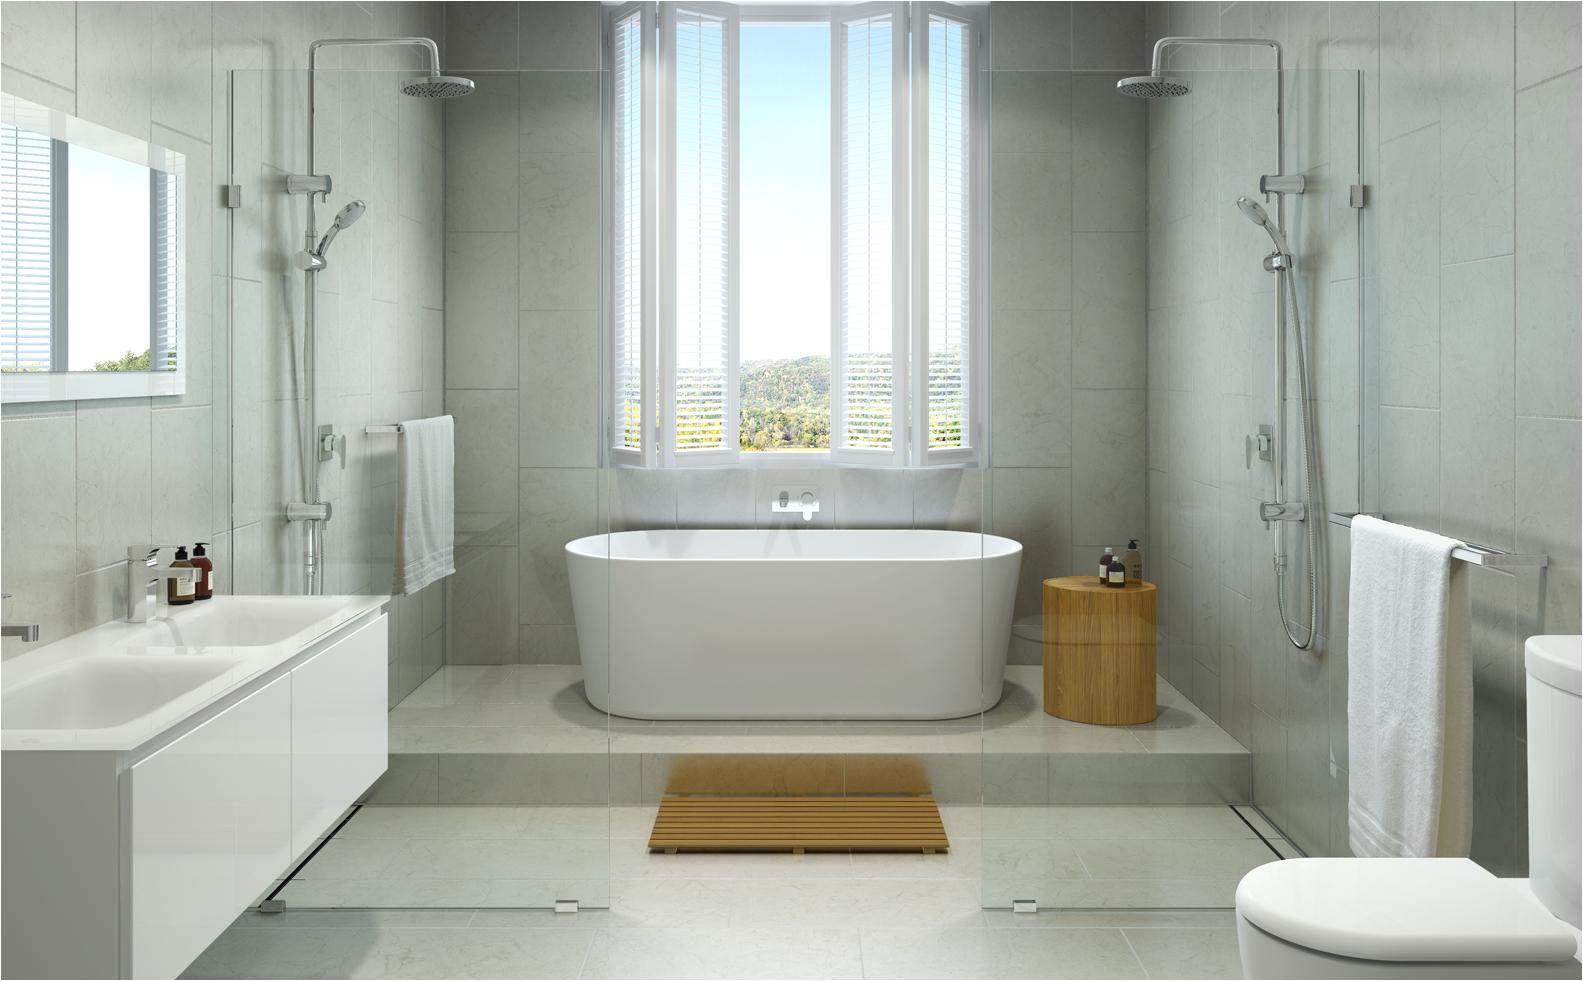 bath freestanding vs built